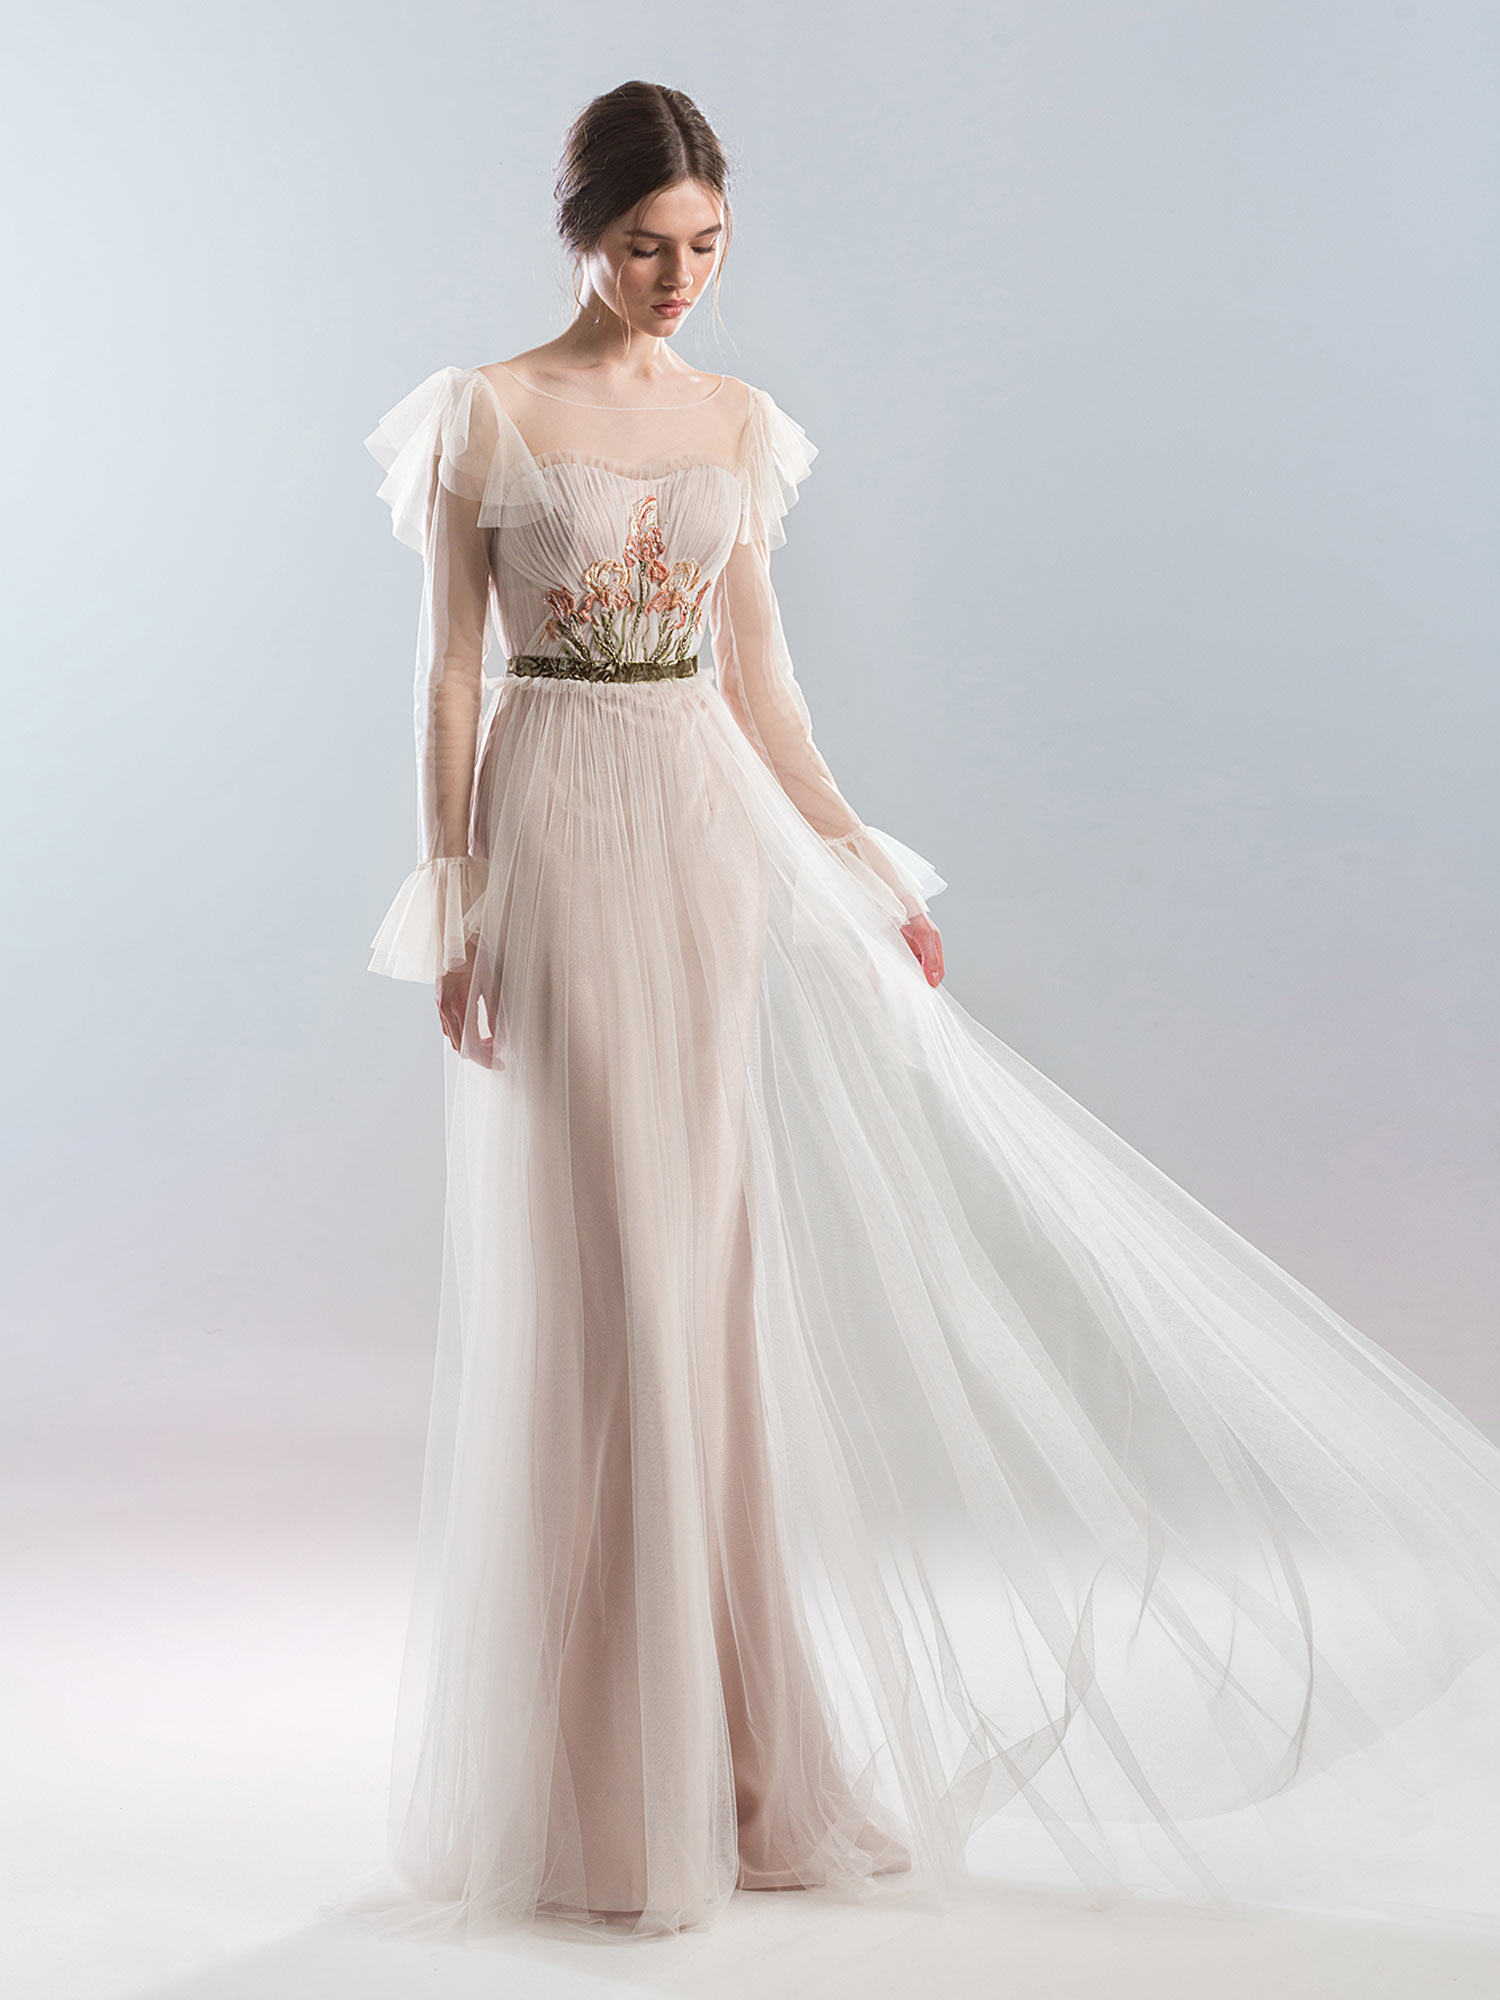 https://i1.wp.com/papiliobridal.com/wp-content/uploads/2019/02/414-wedding-dress.jpg